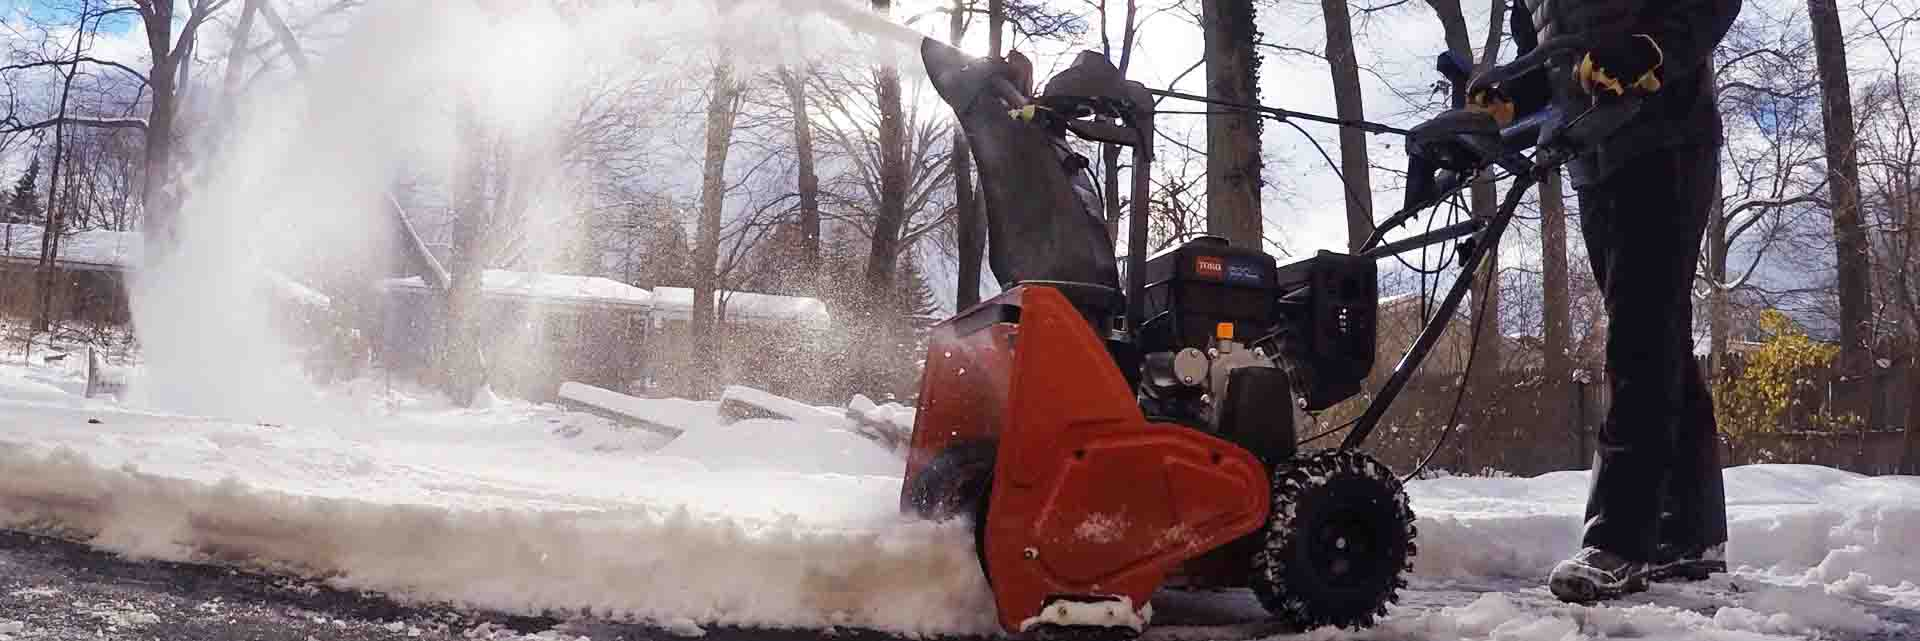 6 Best Heavy-Duty Snow Blowers to Combat Winter Weather